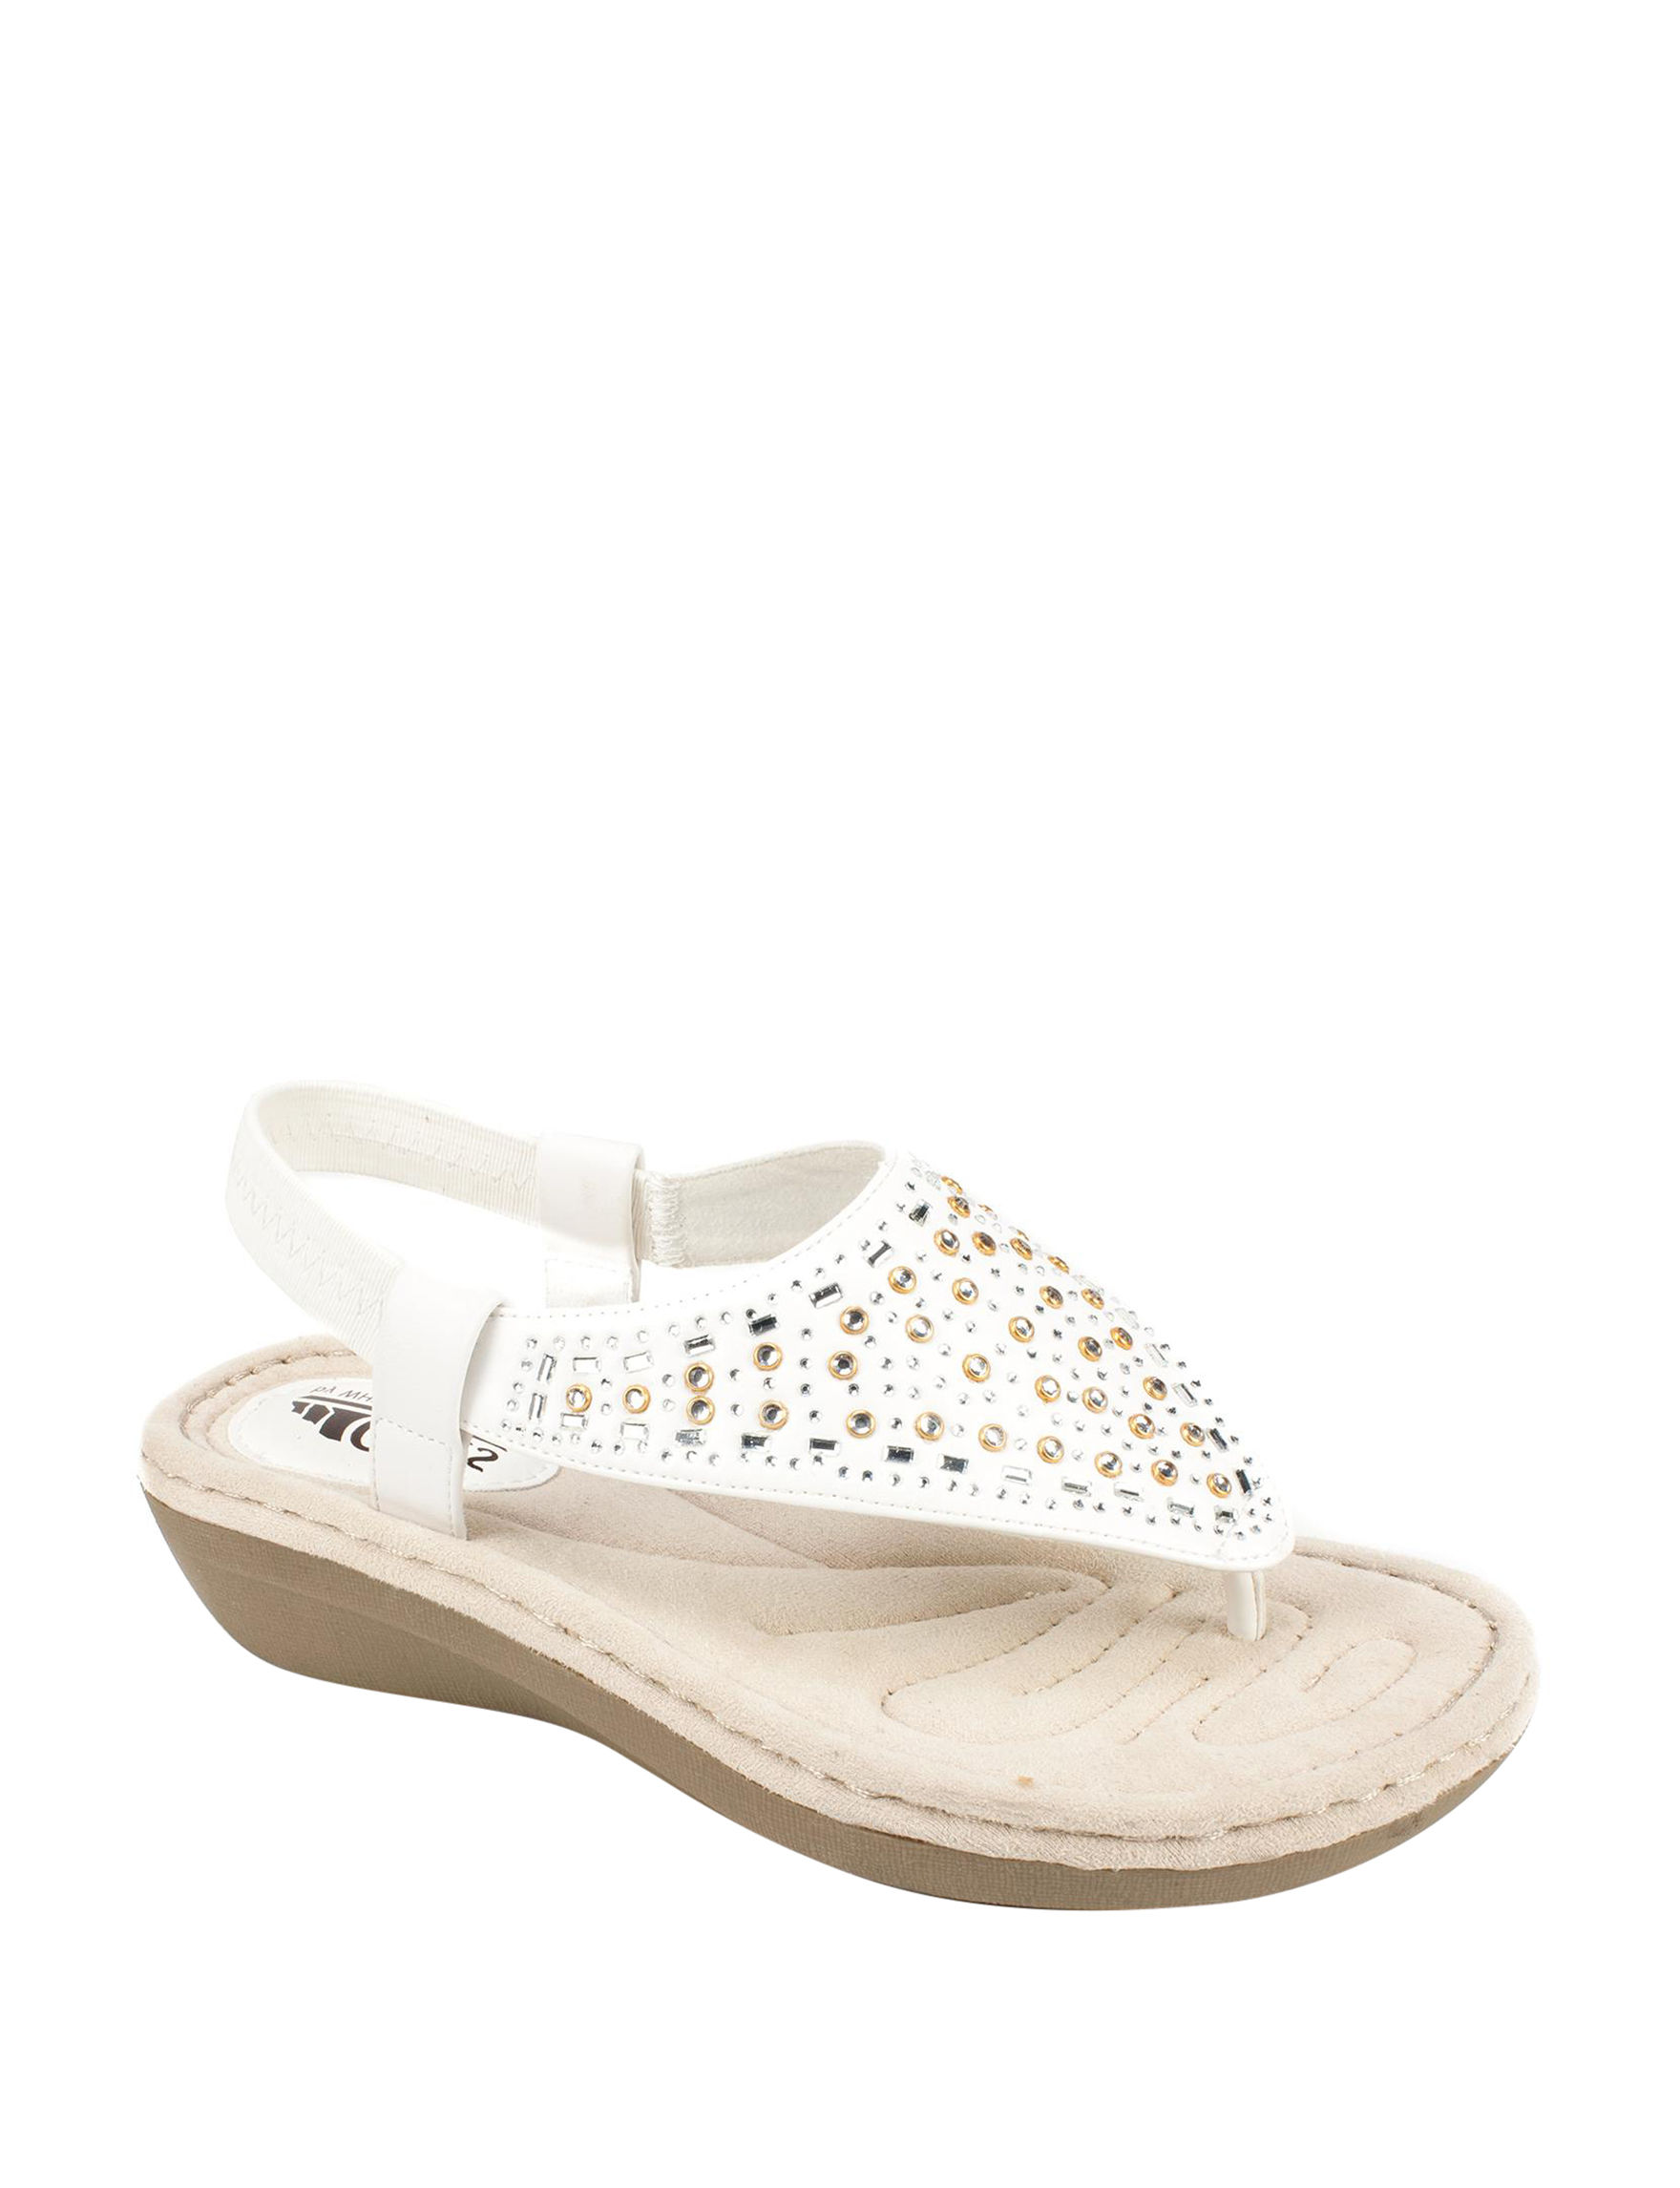 Cliffs White Comfort Shoes Flat Sandals Footbed